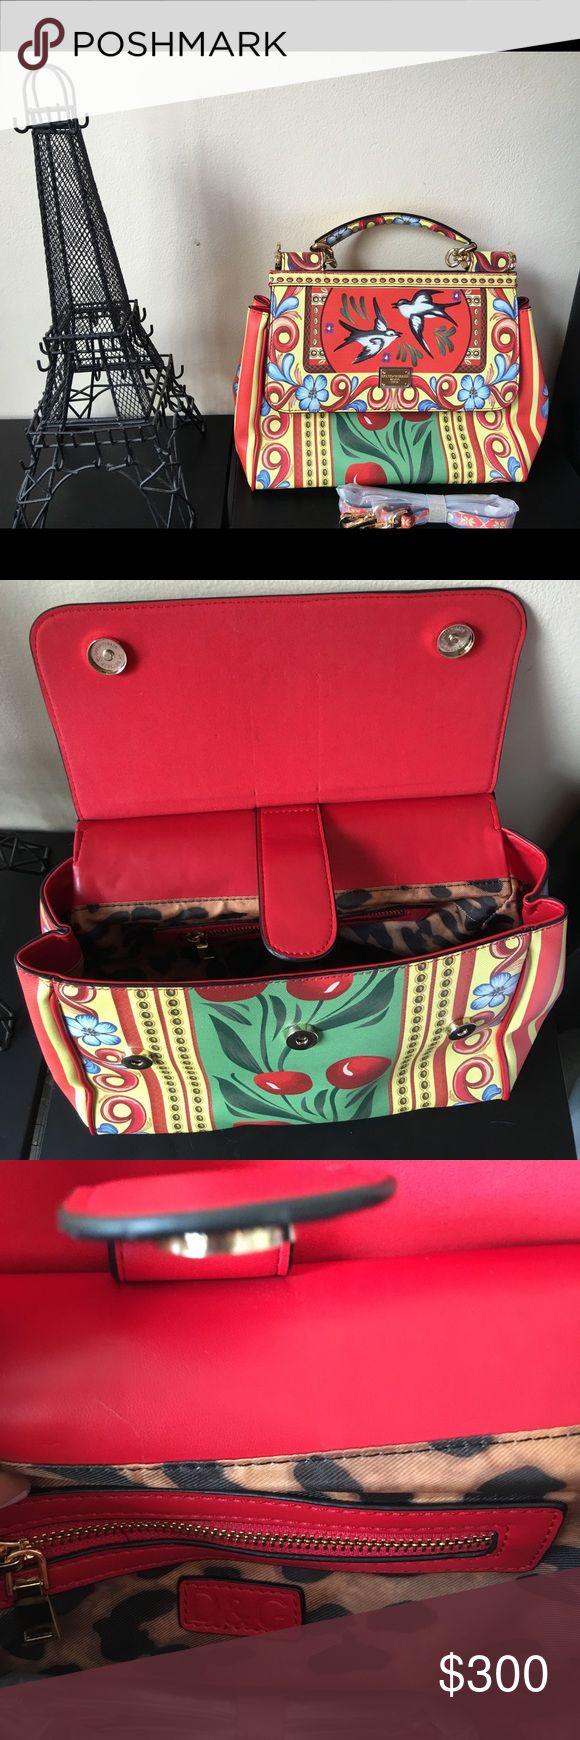 D&G handbag D&G handbag, good condition, you are gonna be a fashion girl D&G Bags